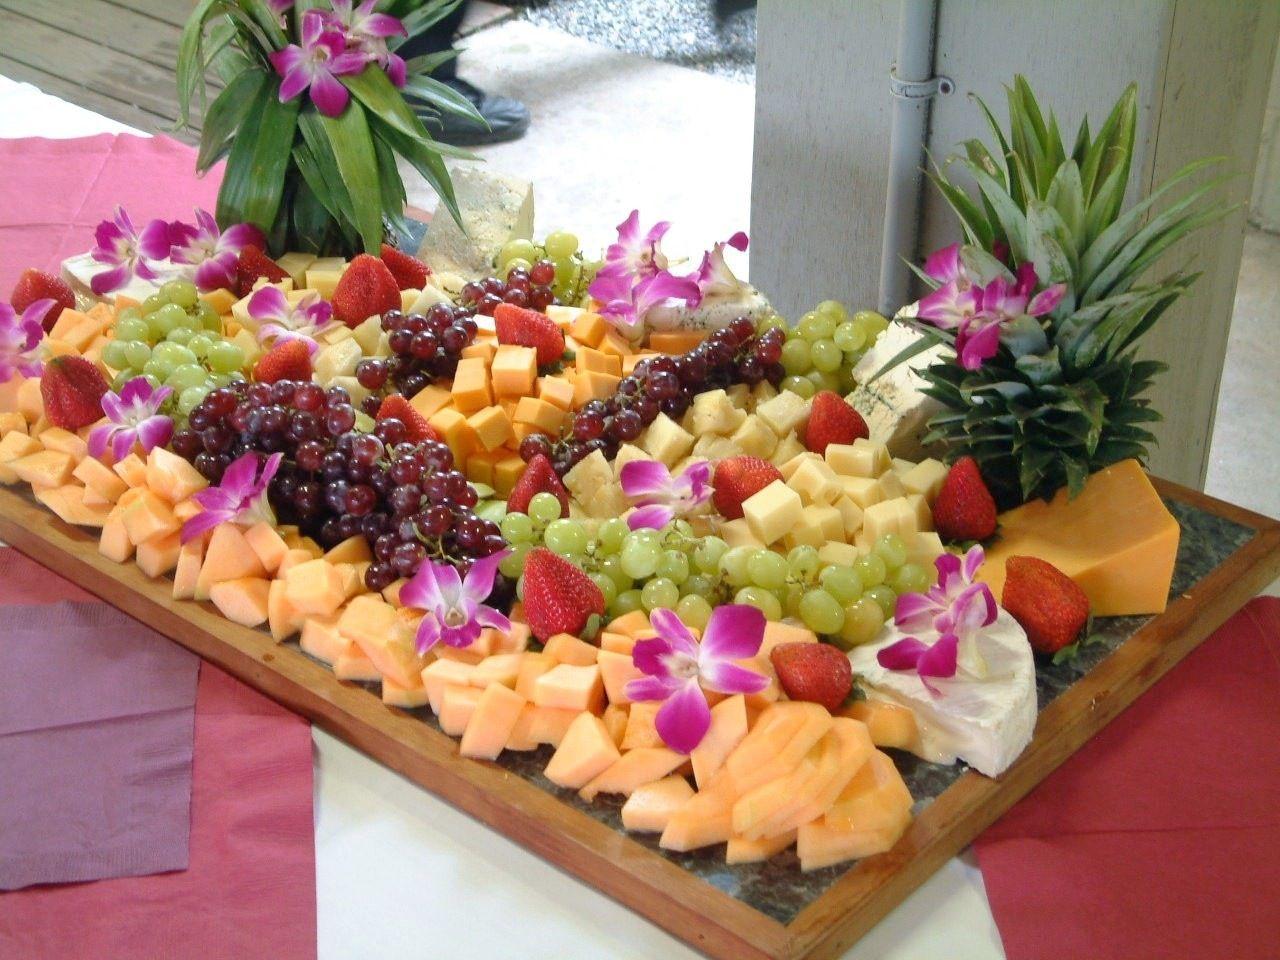 Tropical Fruit Platter For A Beach Wedding: Food Platters